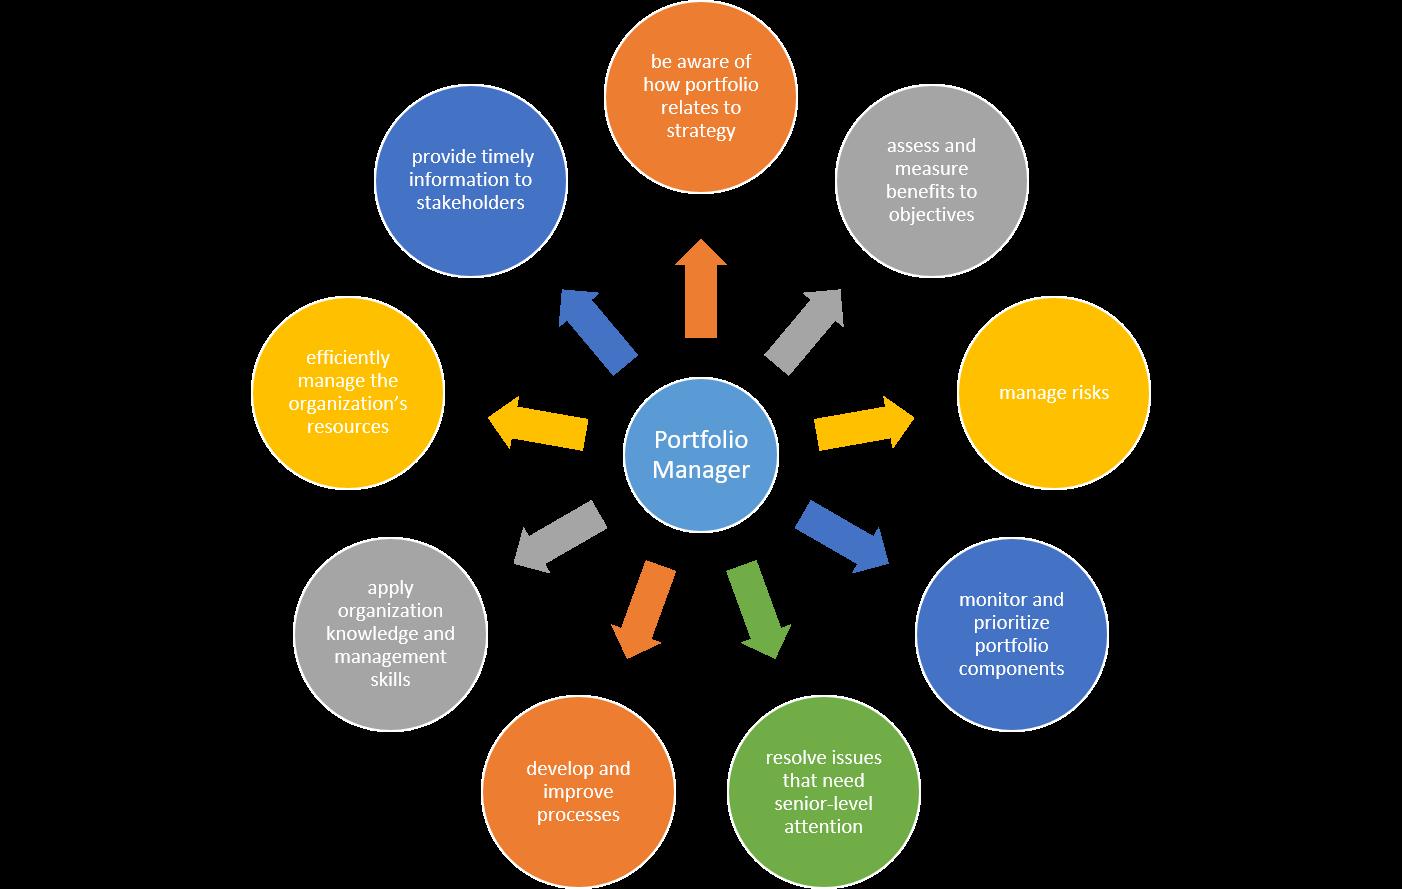 Diagram Of Portfolio Manager Responsibilities  With Images